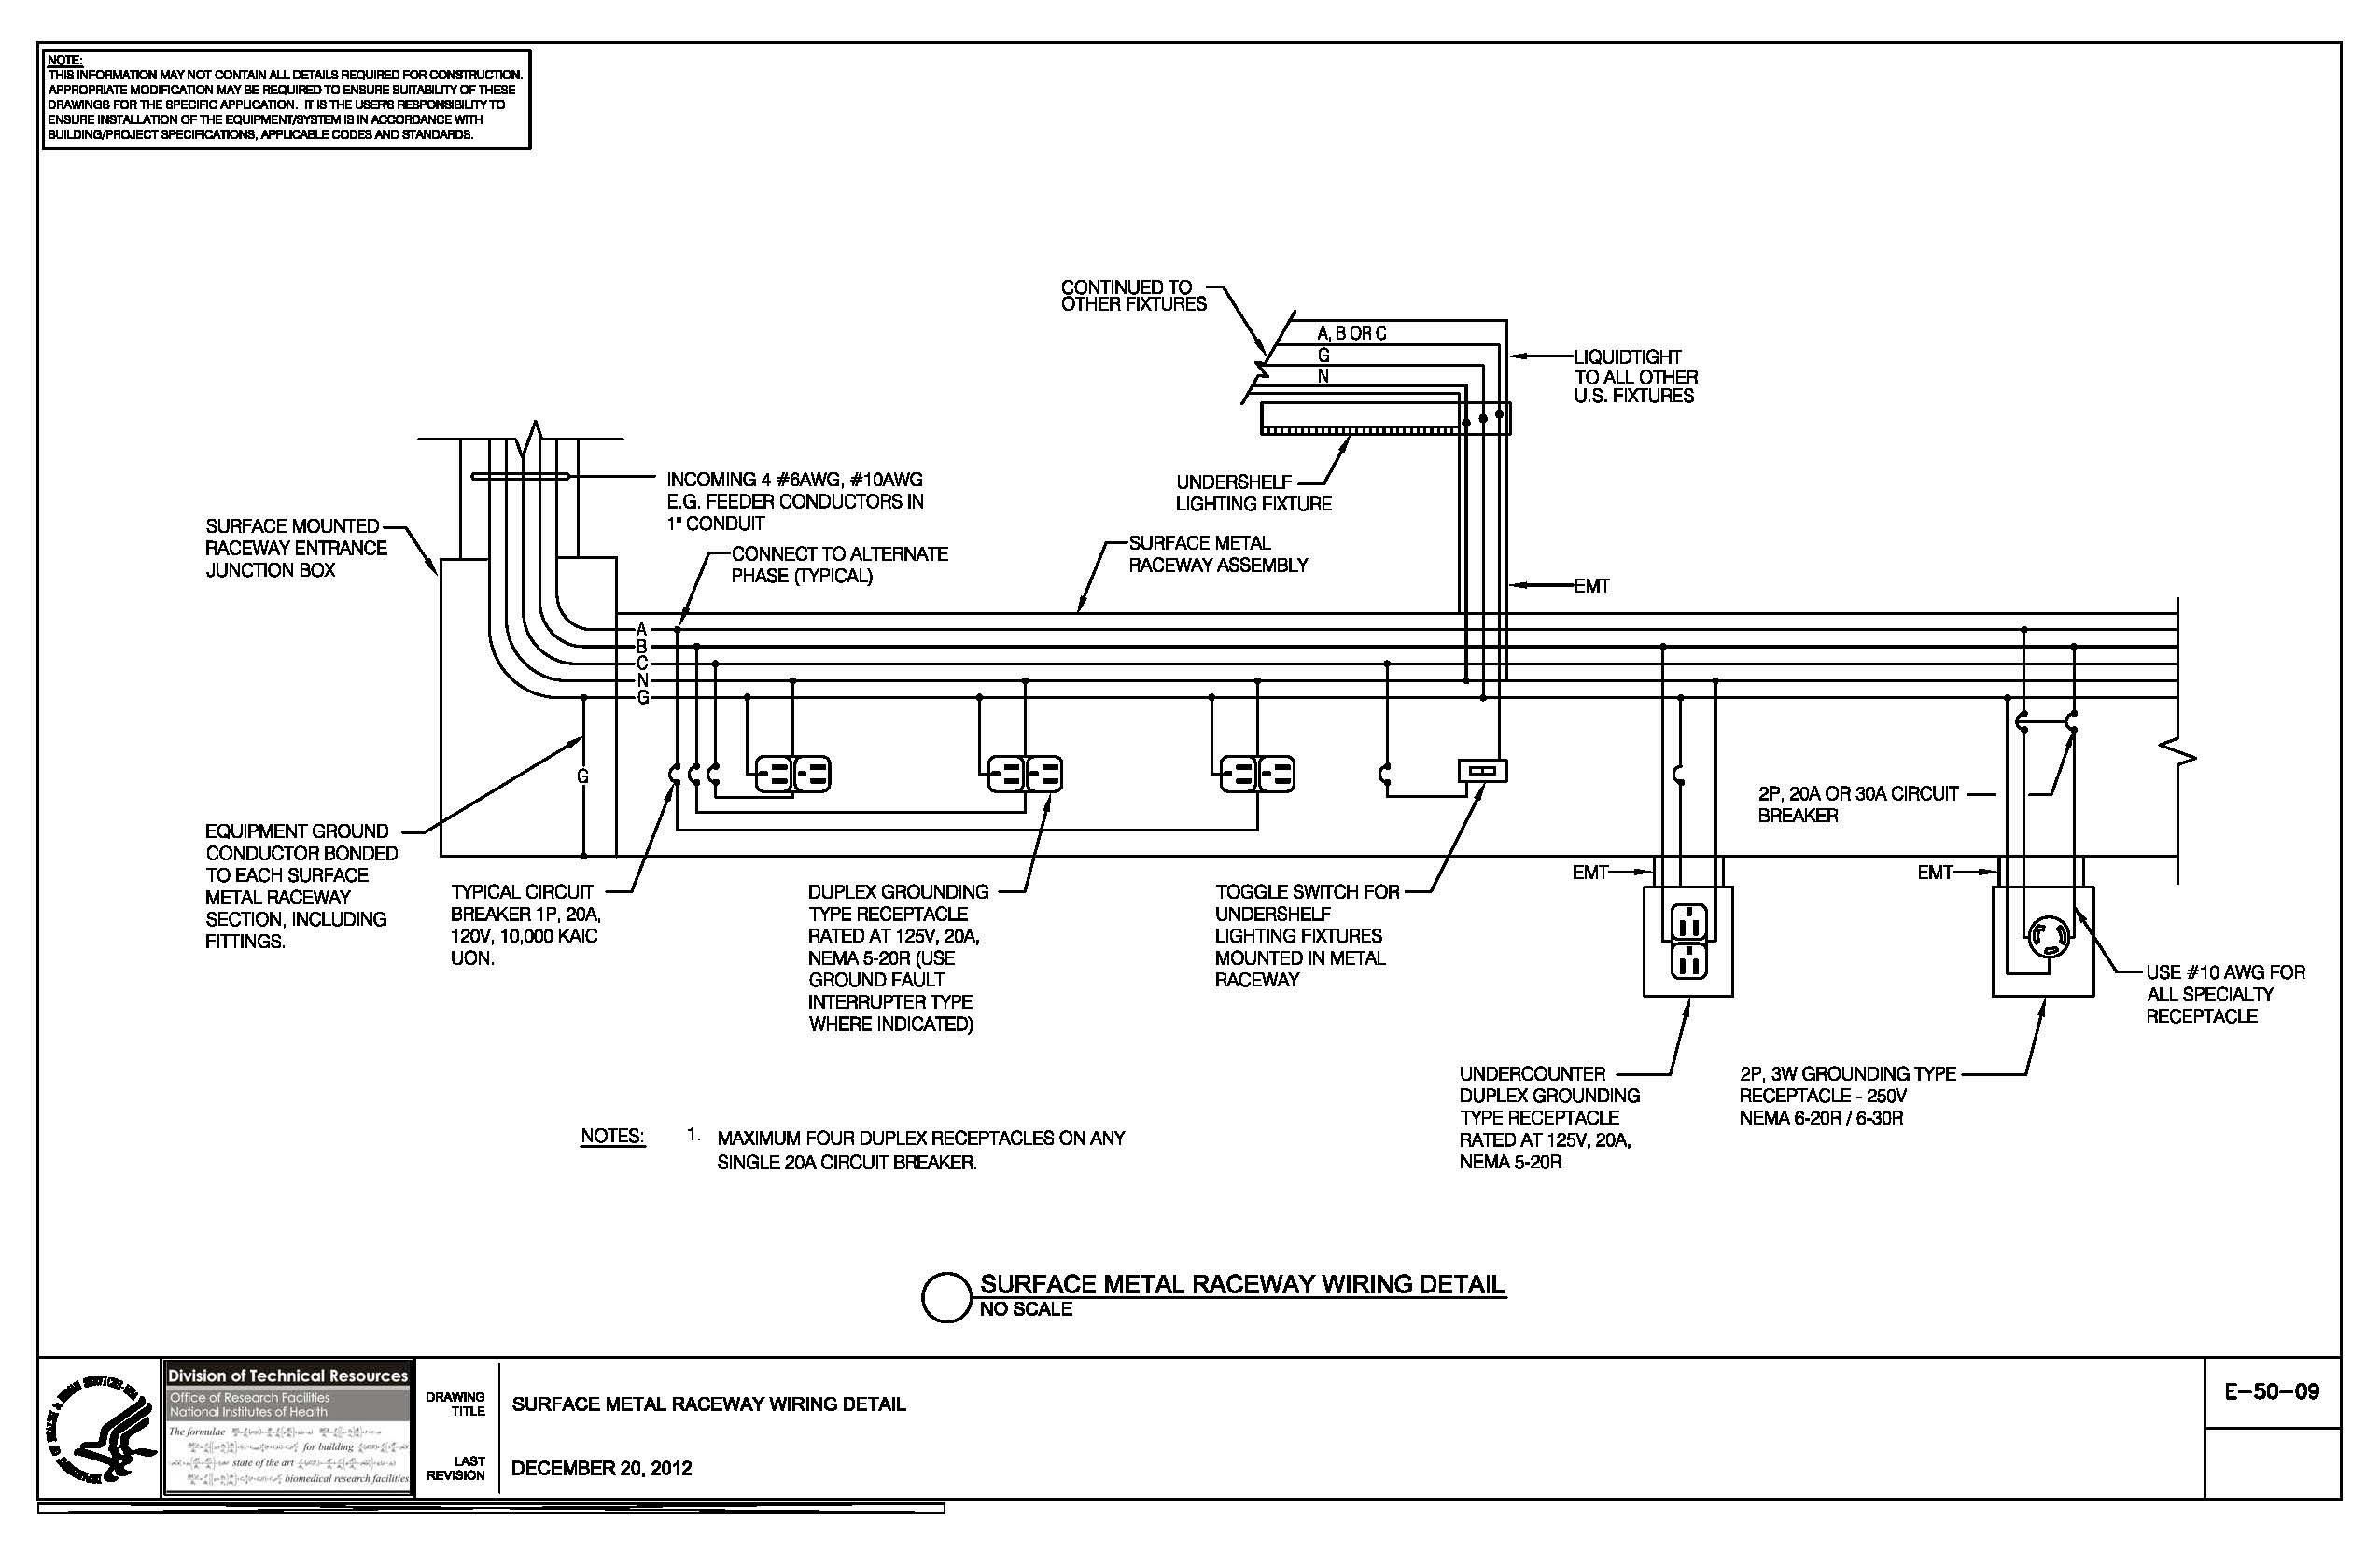 wiring diagram rv tank level monitor little giant ec 1 wiring diagram | free wiring diagram